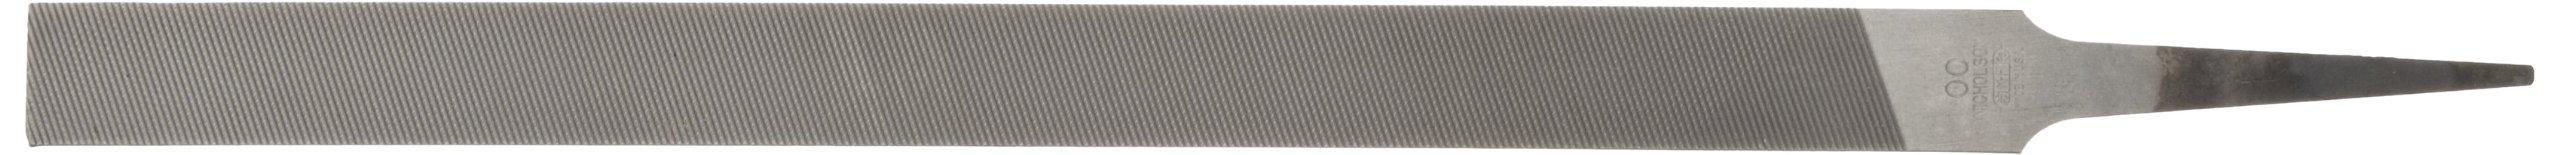 Nicholson Pillar File, Swiss Pattern, Double Cut, Rectangular, #00 Coarseness, 10'' Length